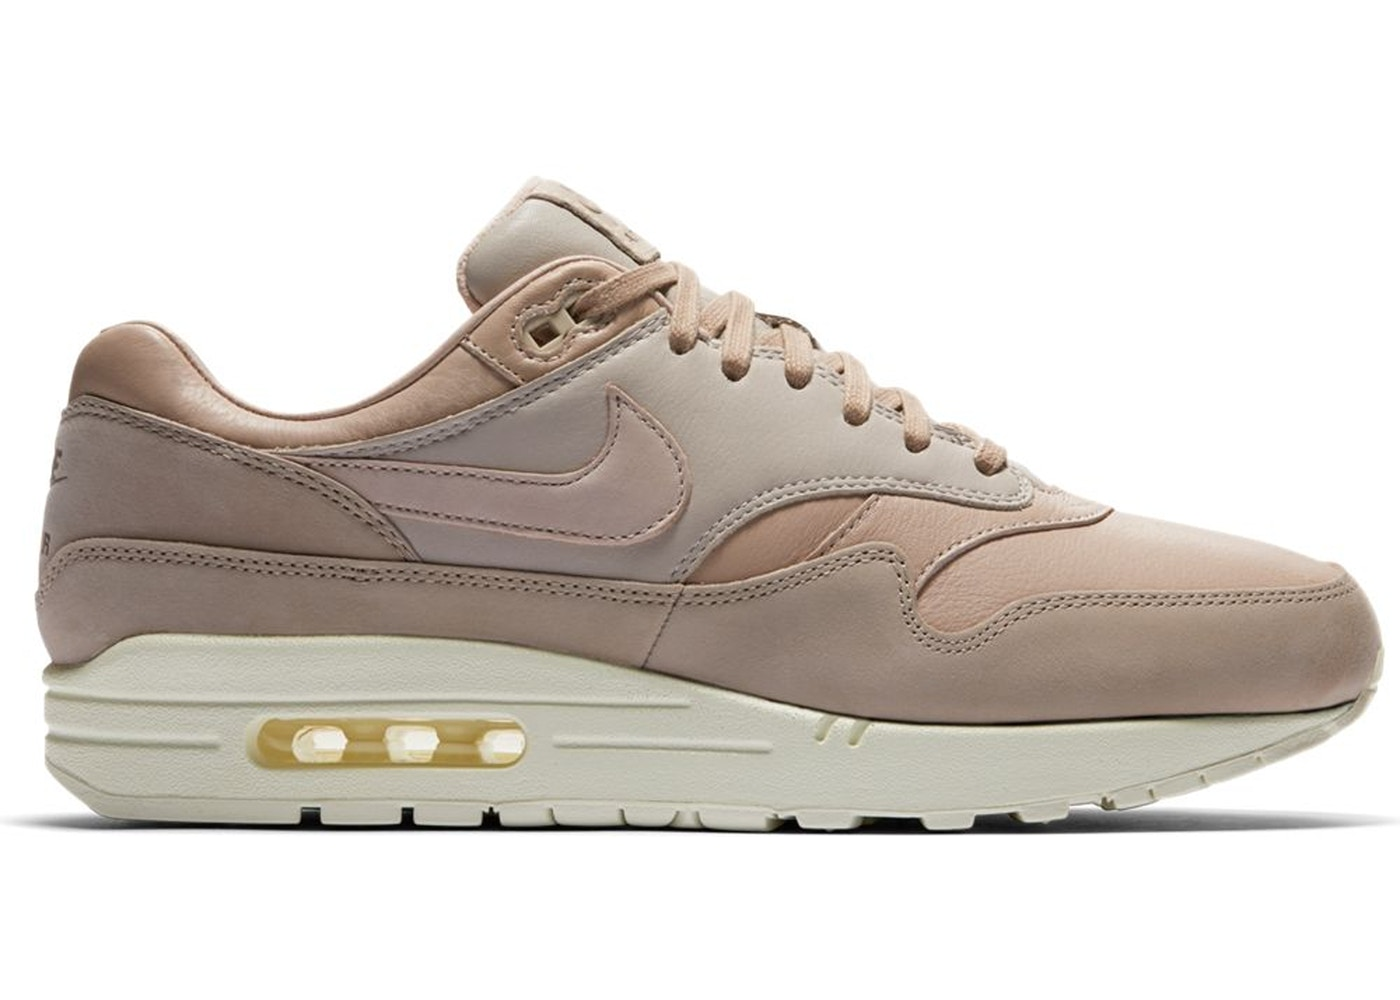 Ordenado muy Que  Nike Air Max 1 Pinnacle Sand - 859554-201